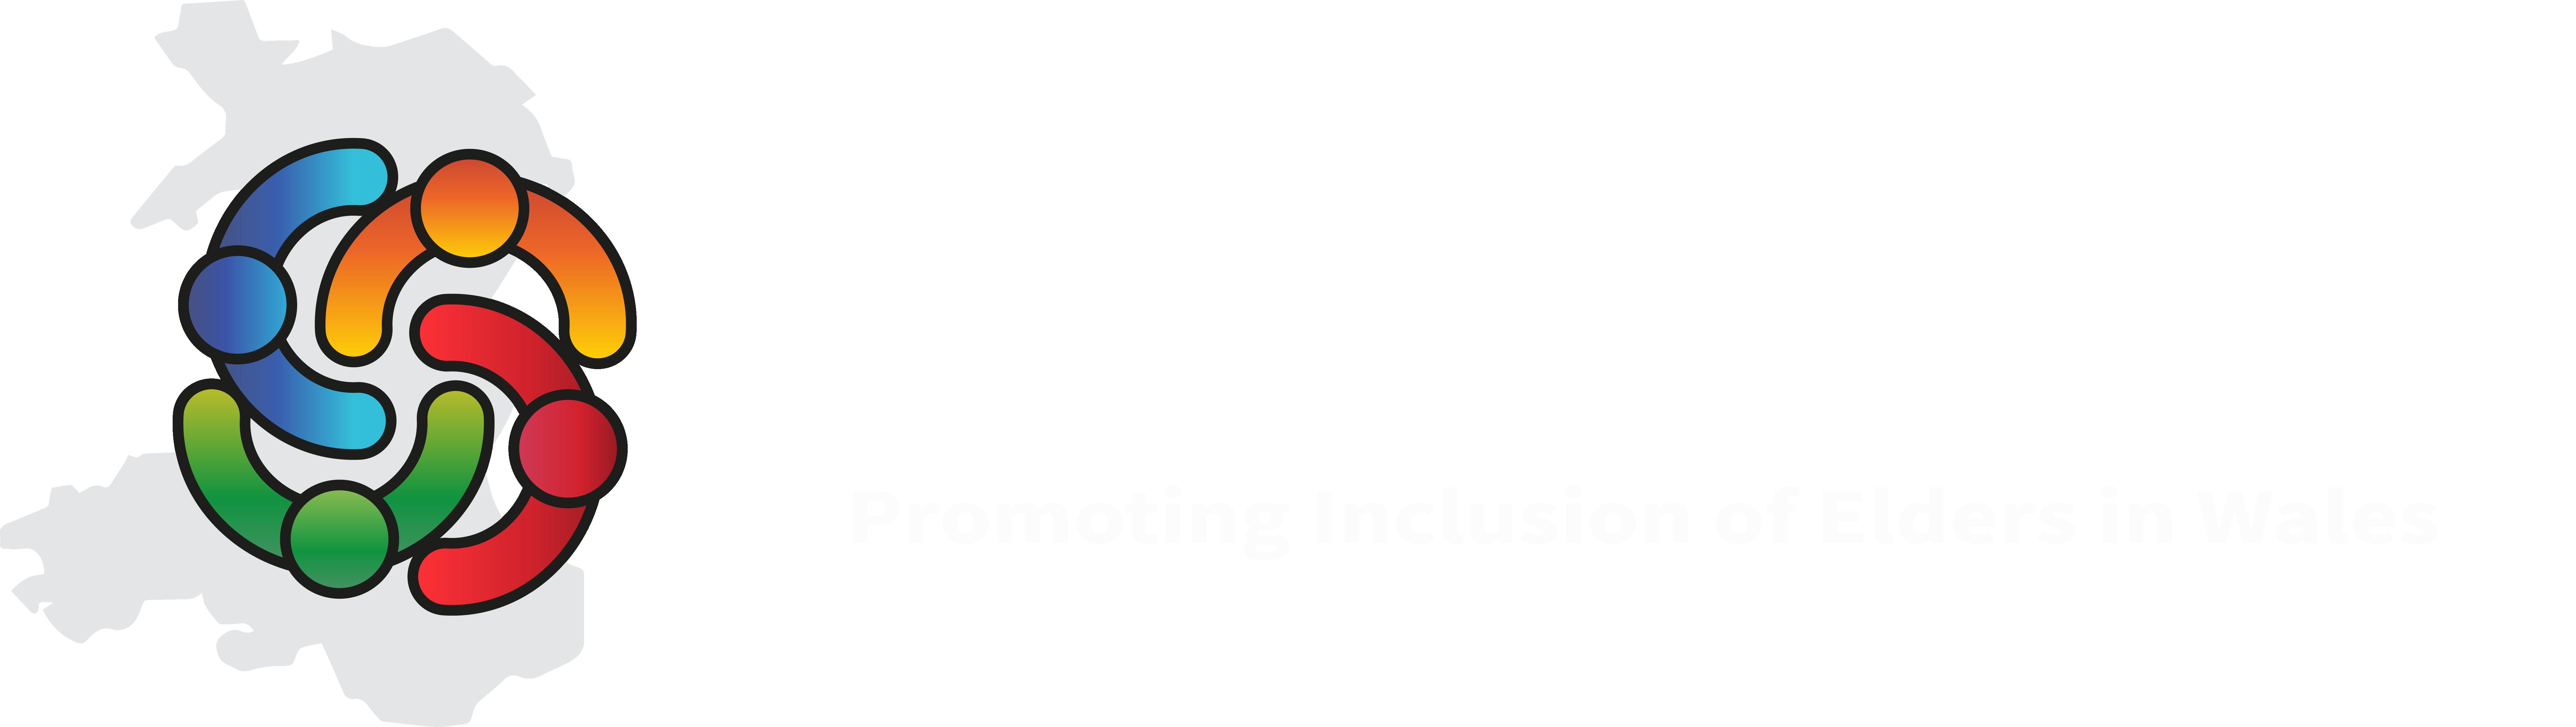 Windrush Cymru Elders logo